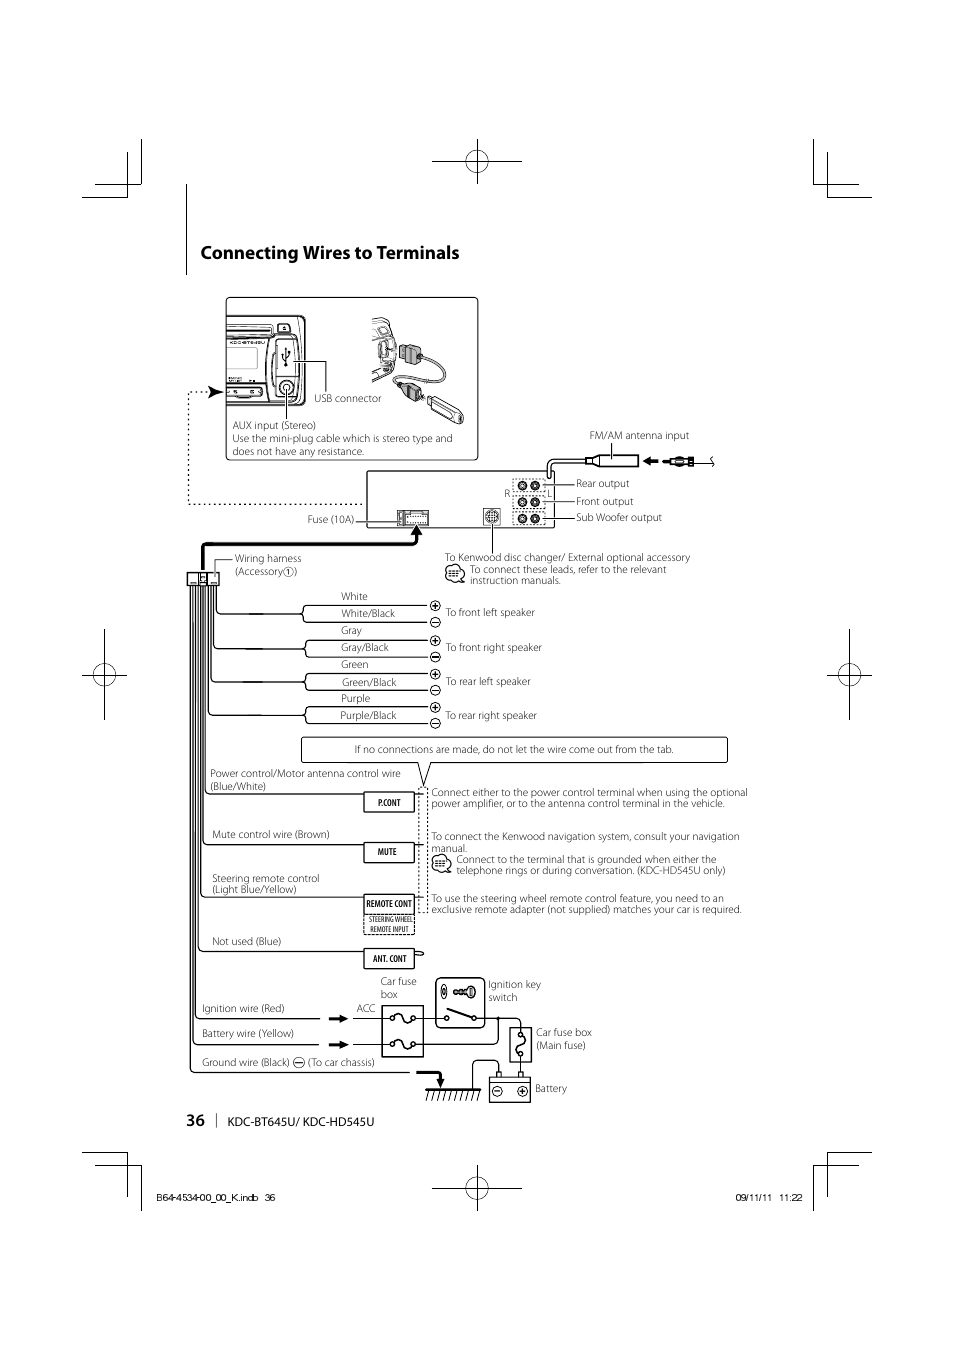 kenwood kdc wiring diagram 2008 pontiac vibe radio connecting wires to terminals hd545u user manual page 36 128